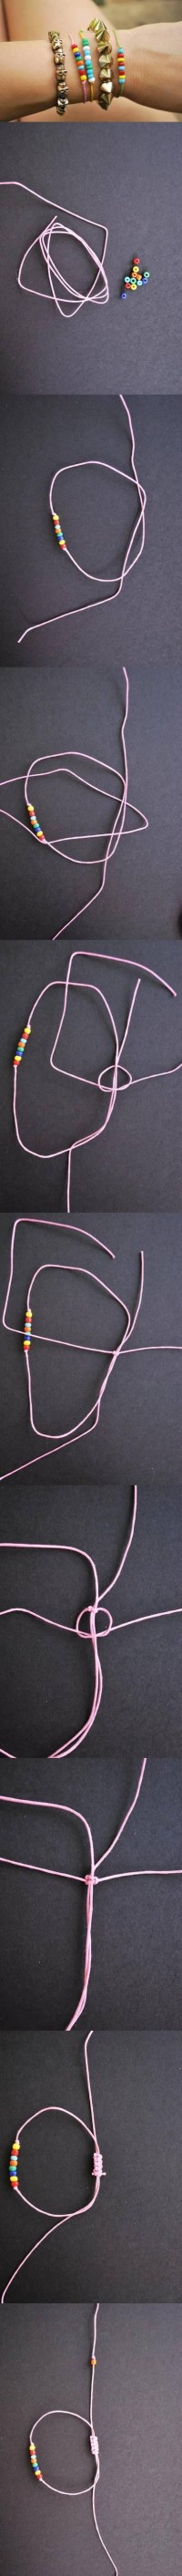 DIY Rainbow Beads and Bracelets | UsefulDIY.com